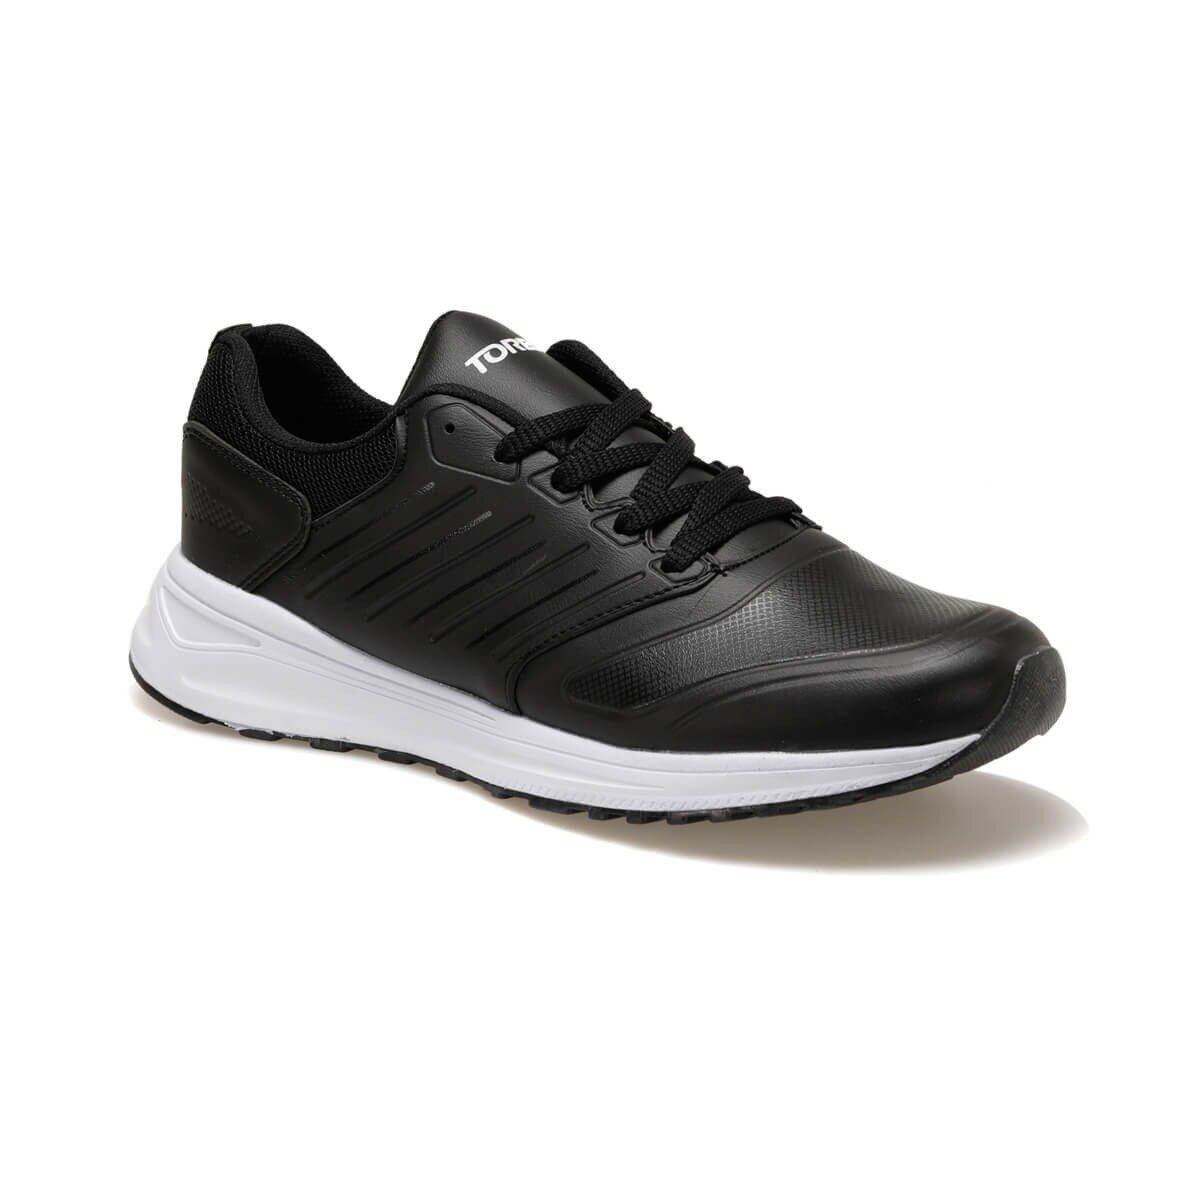 FLO VALERO Black Men 'S Sneaker Shoes Torex